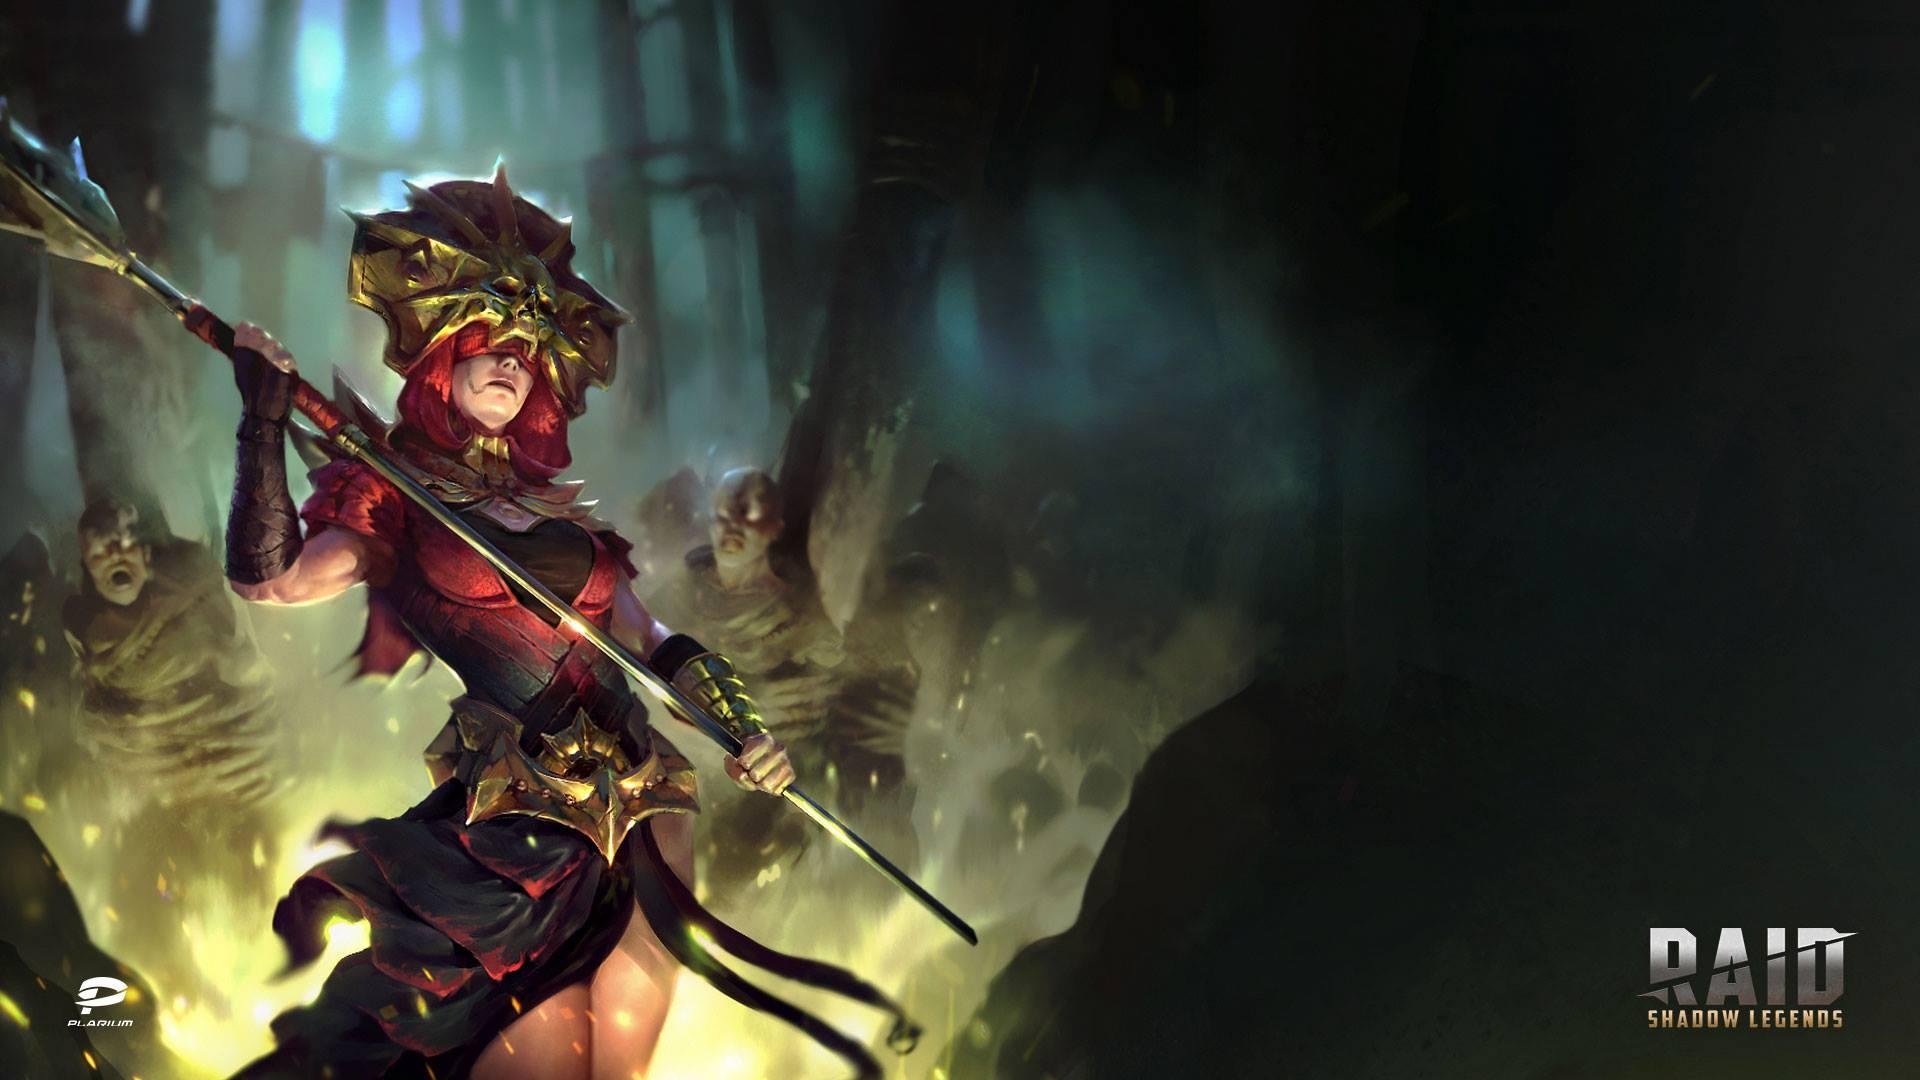 Raid Shadow Legends desktop background